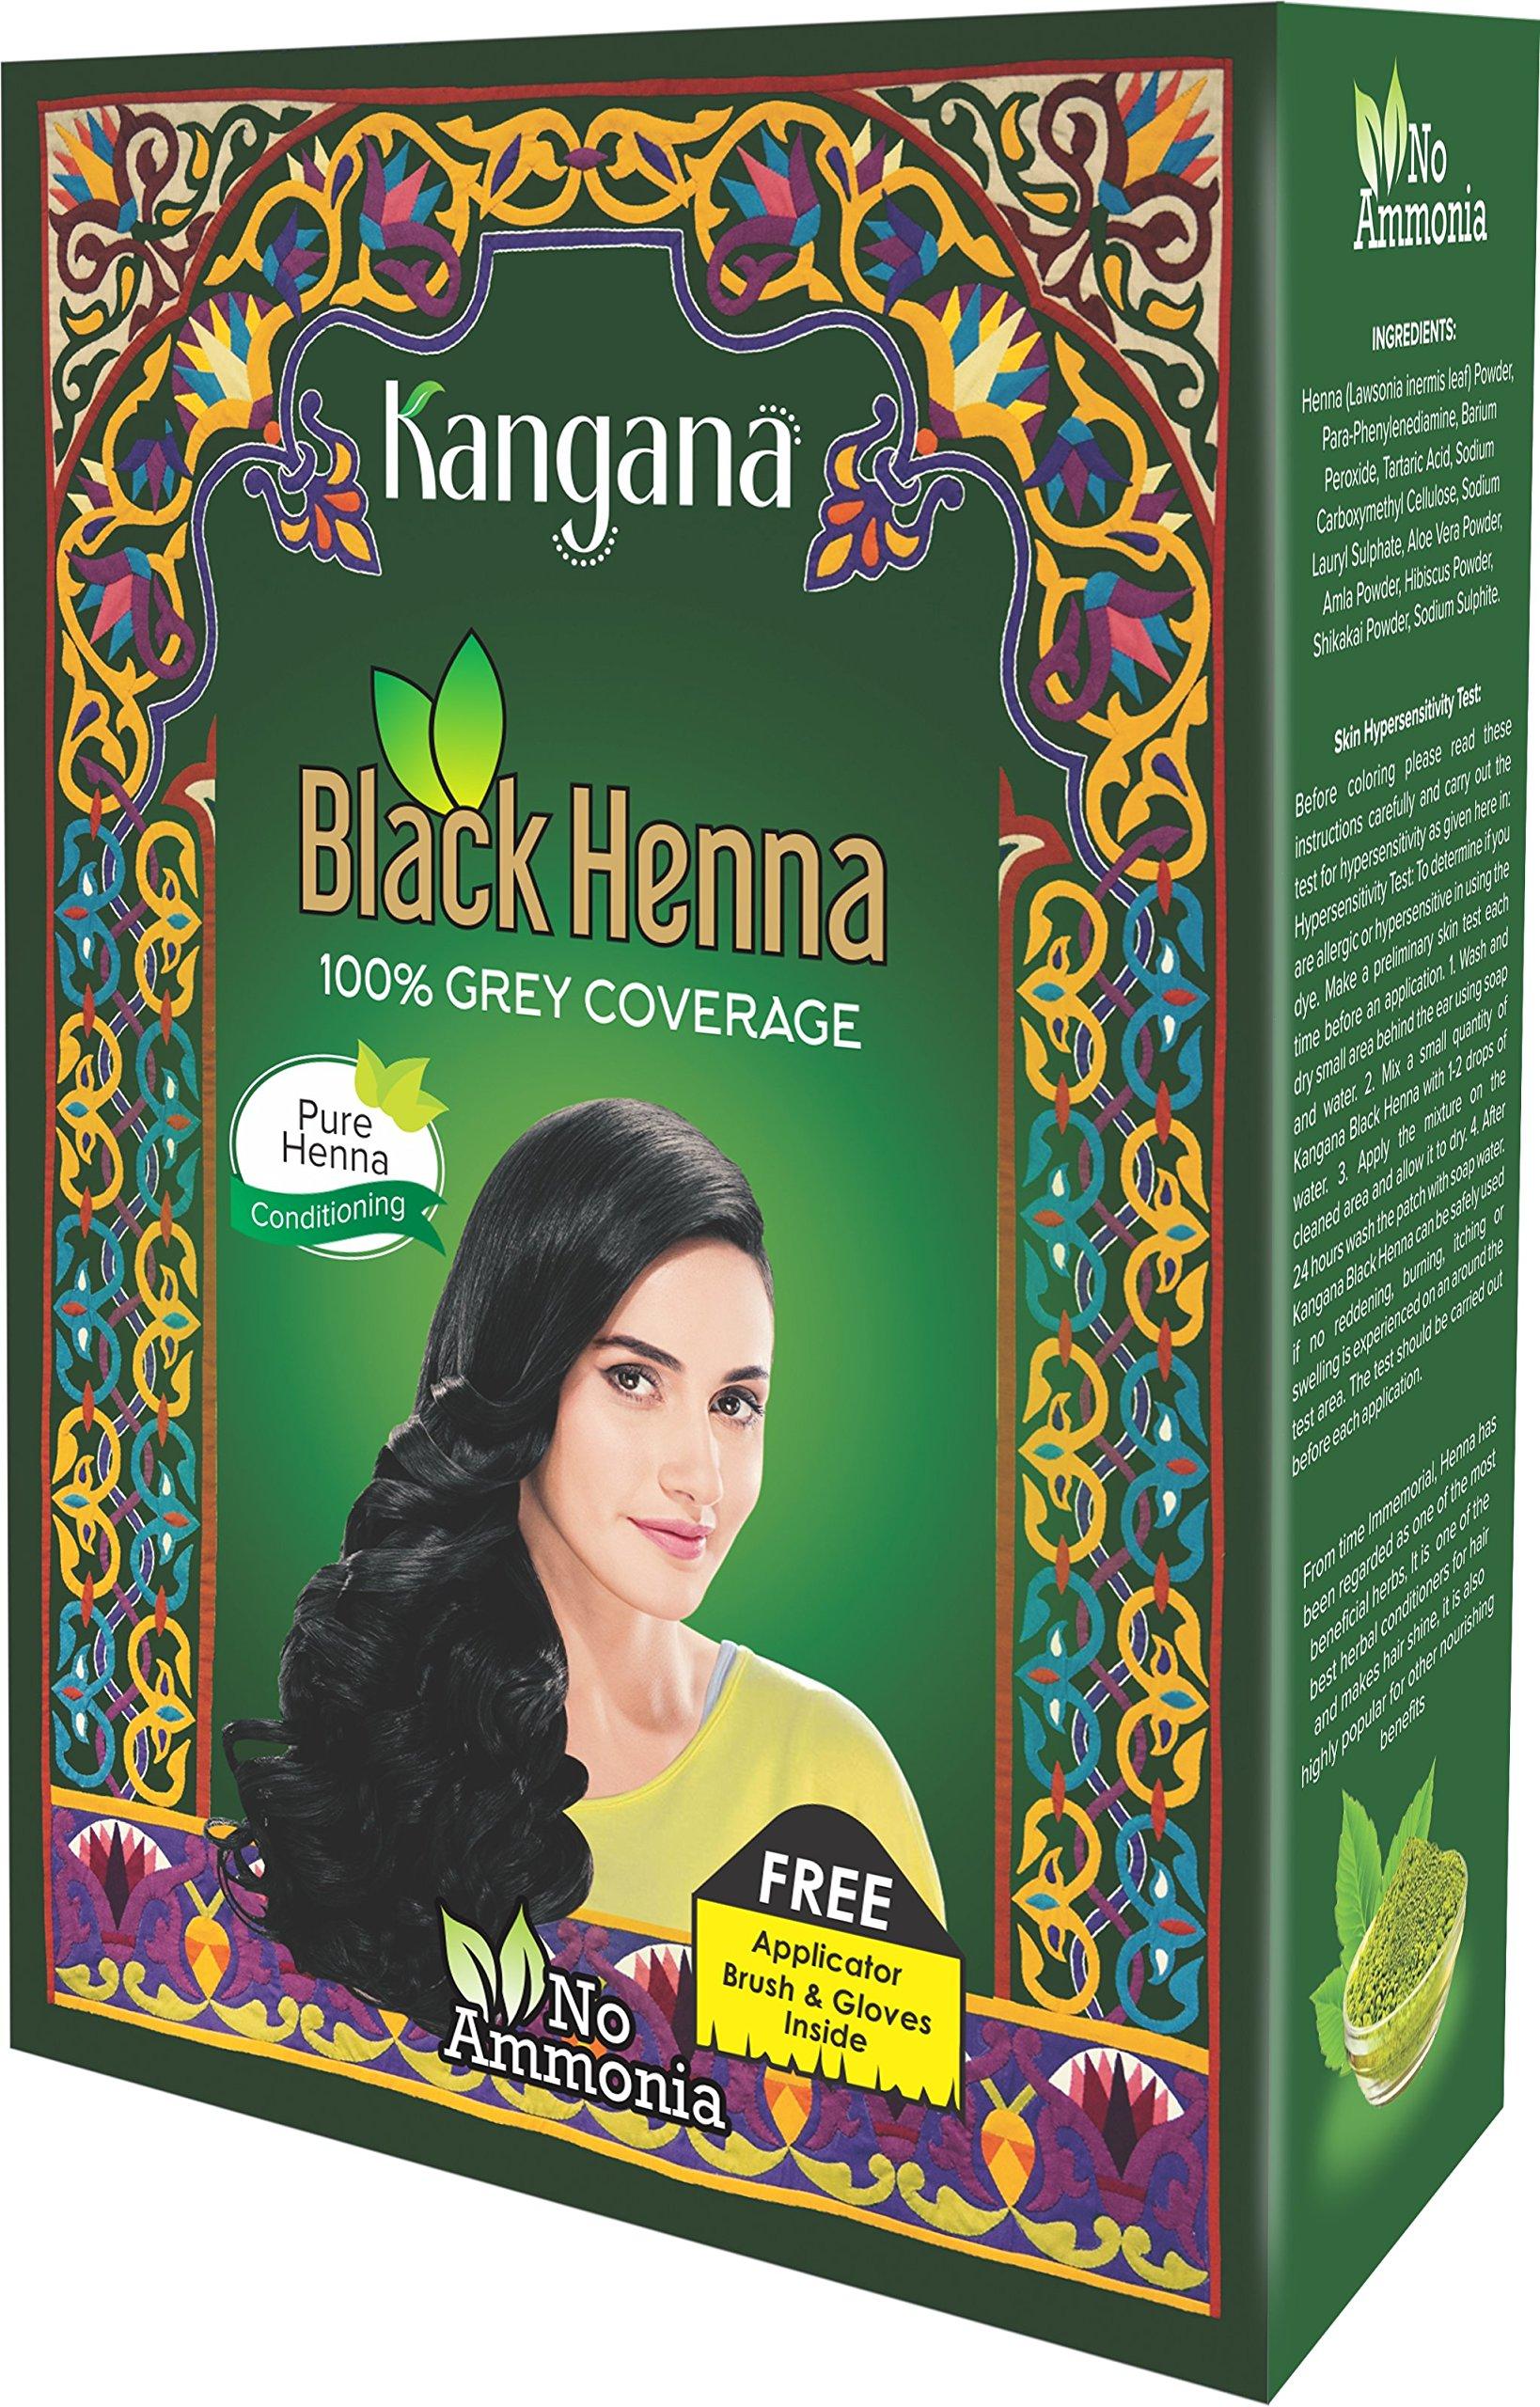 Kangana Black Henna Powder Coverage